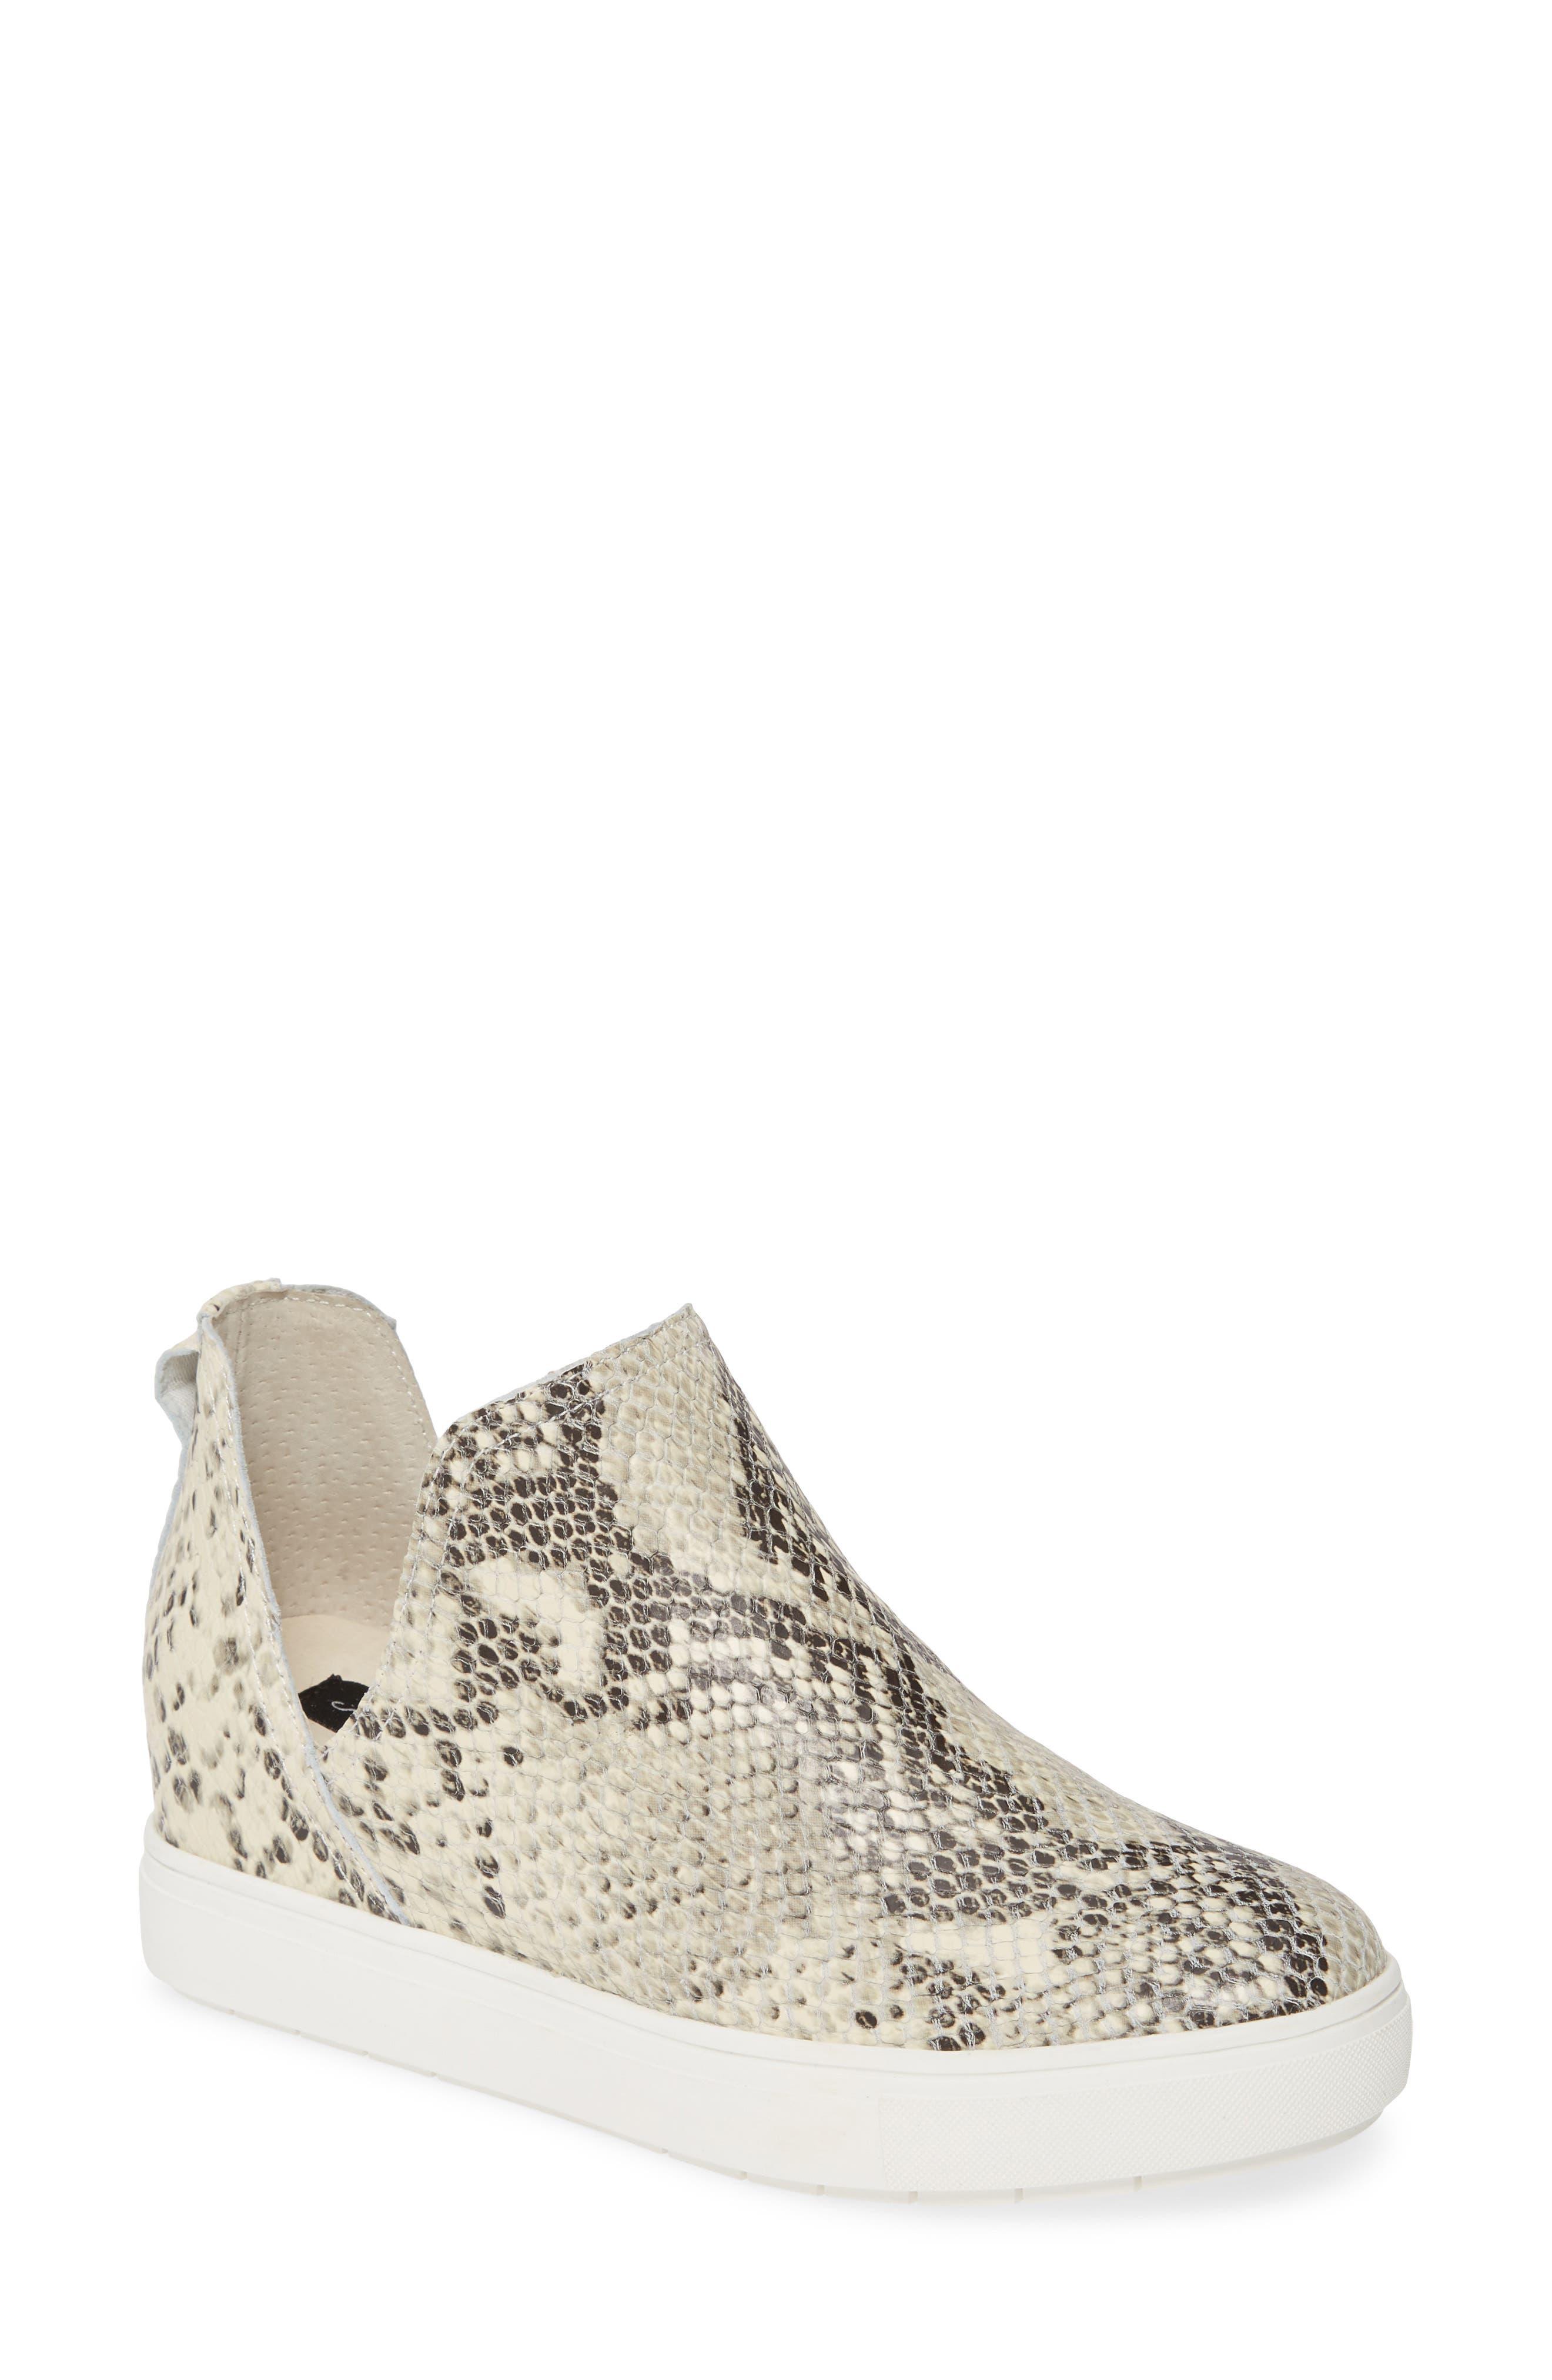 Steven By Steve Madden Canares High Top Sneaker- White